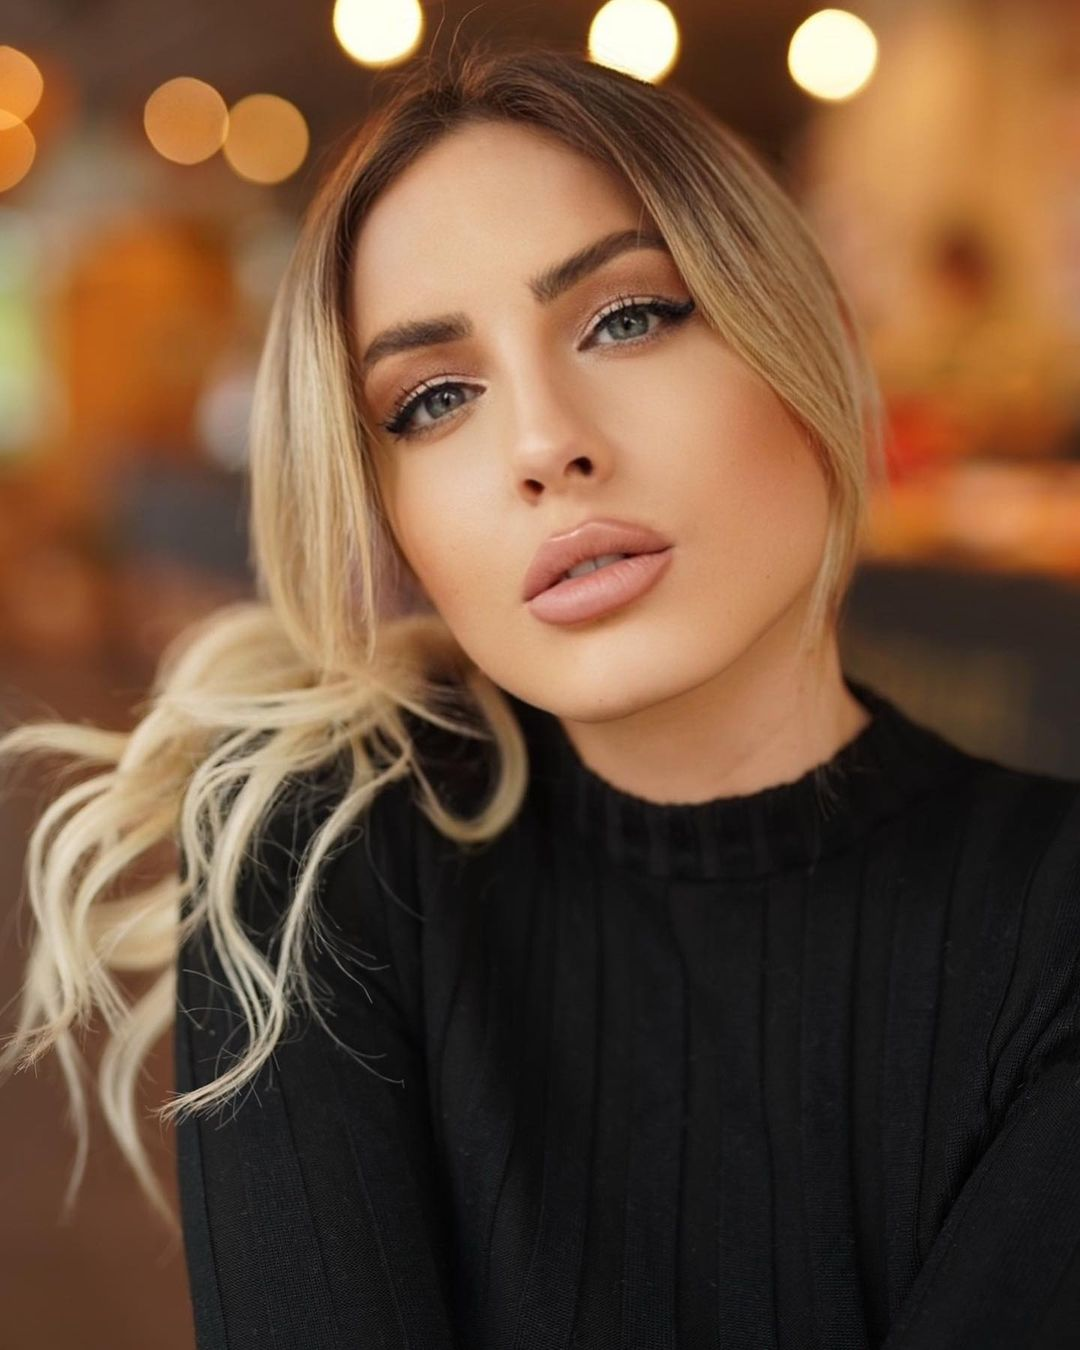 Doreen-Petrova-Wallpapers-Insta-Fit-Bio-12